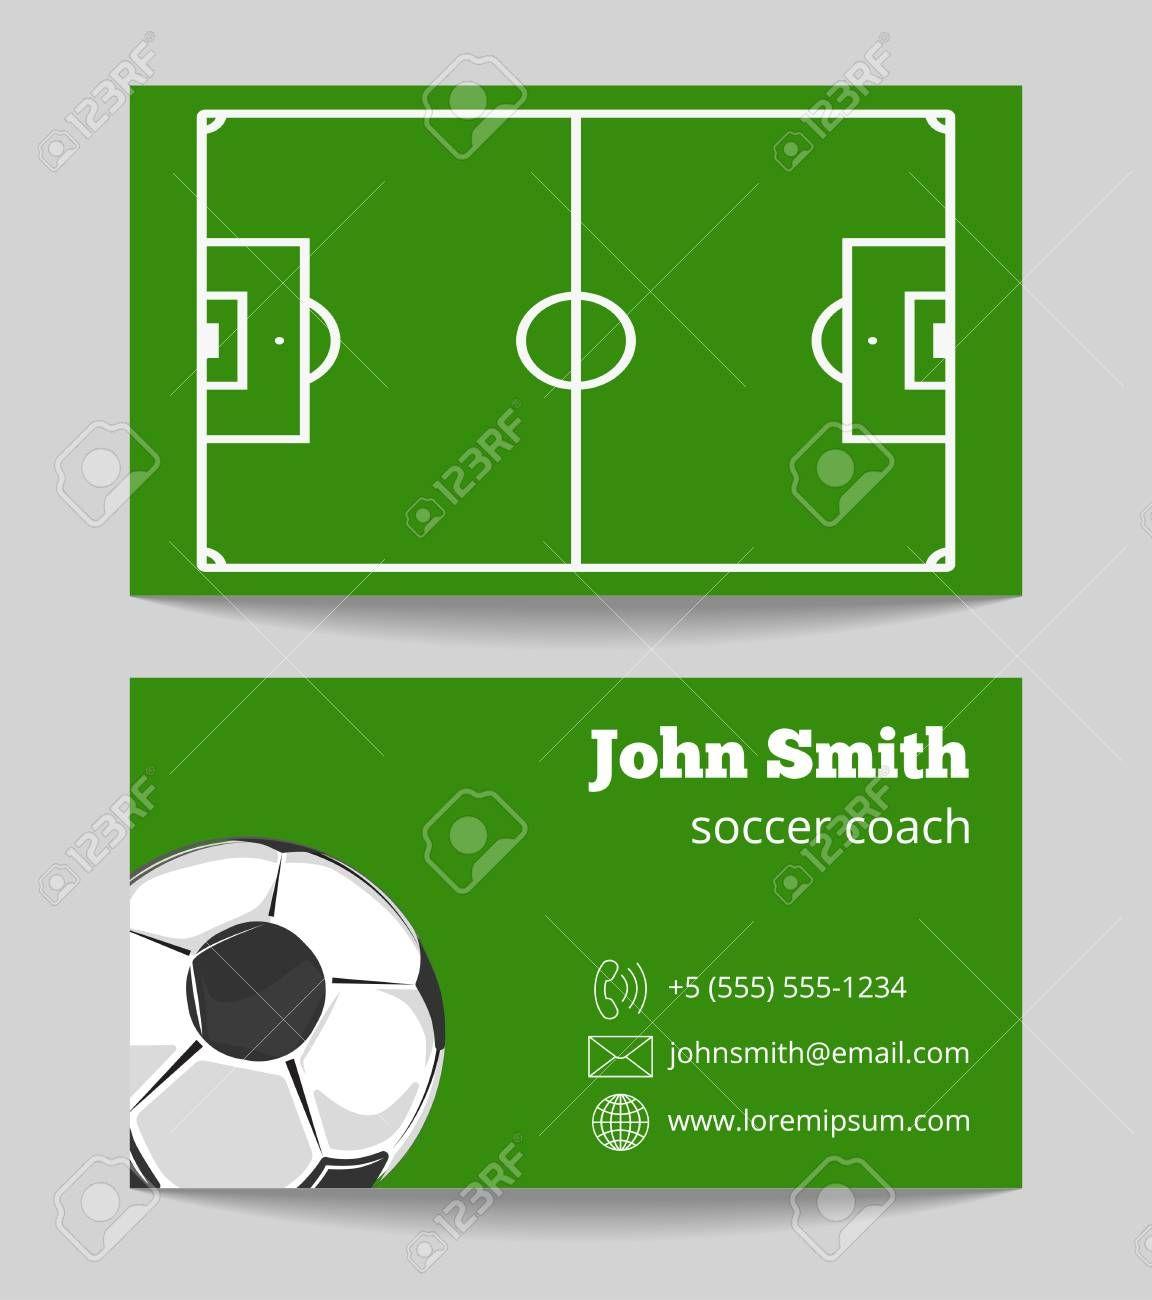 Soccer Green Field Business Card Template Football Field On Regarding Soccer Referee Game Card Template Soccer Referee Business Card Template Football Field